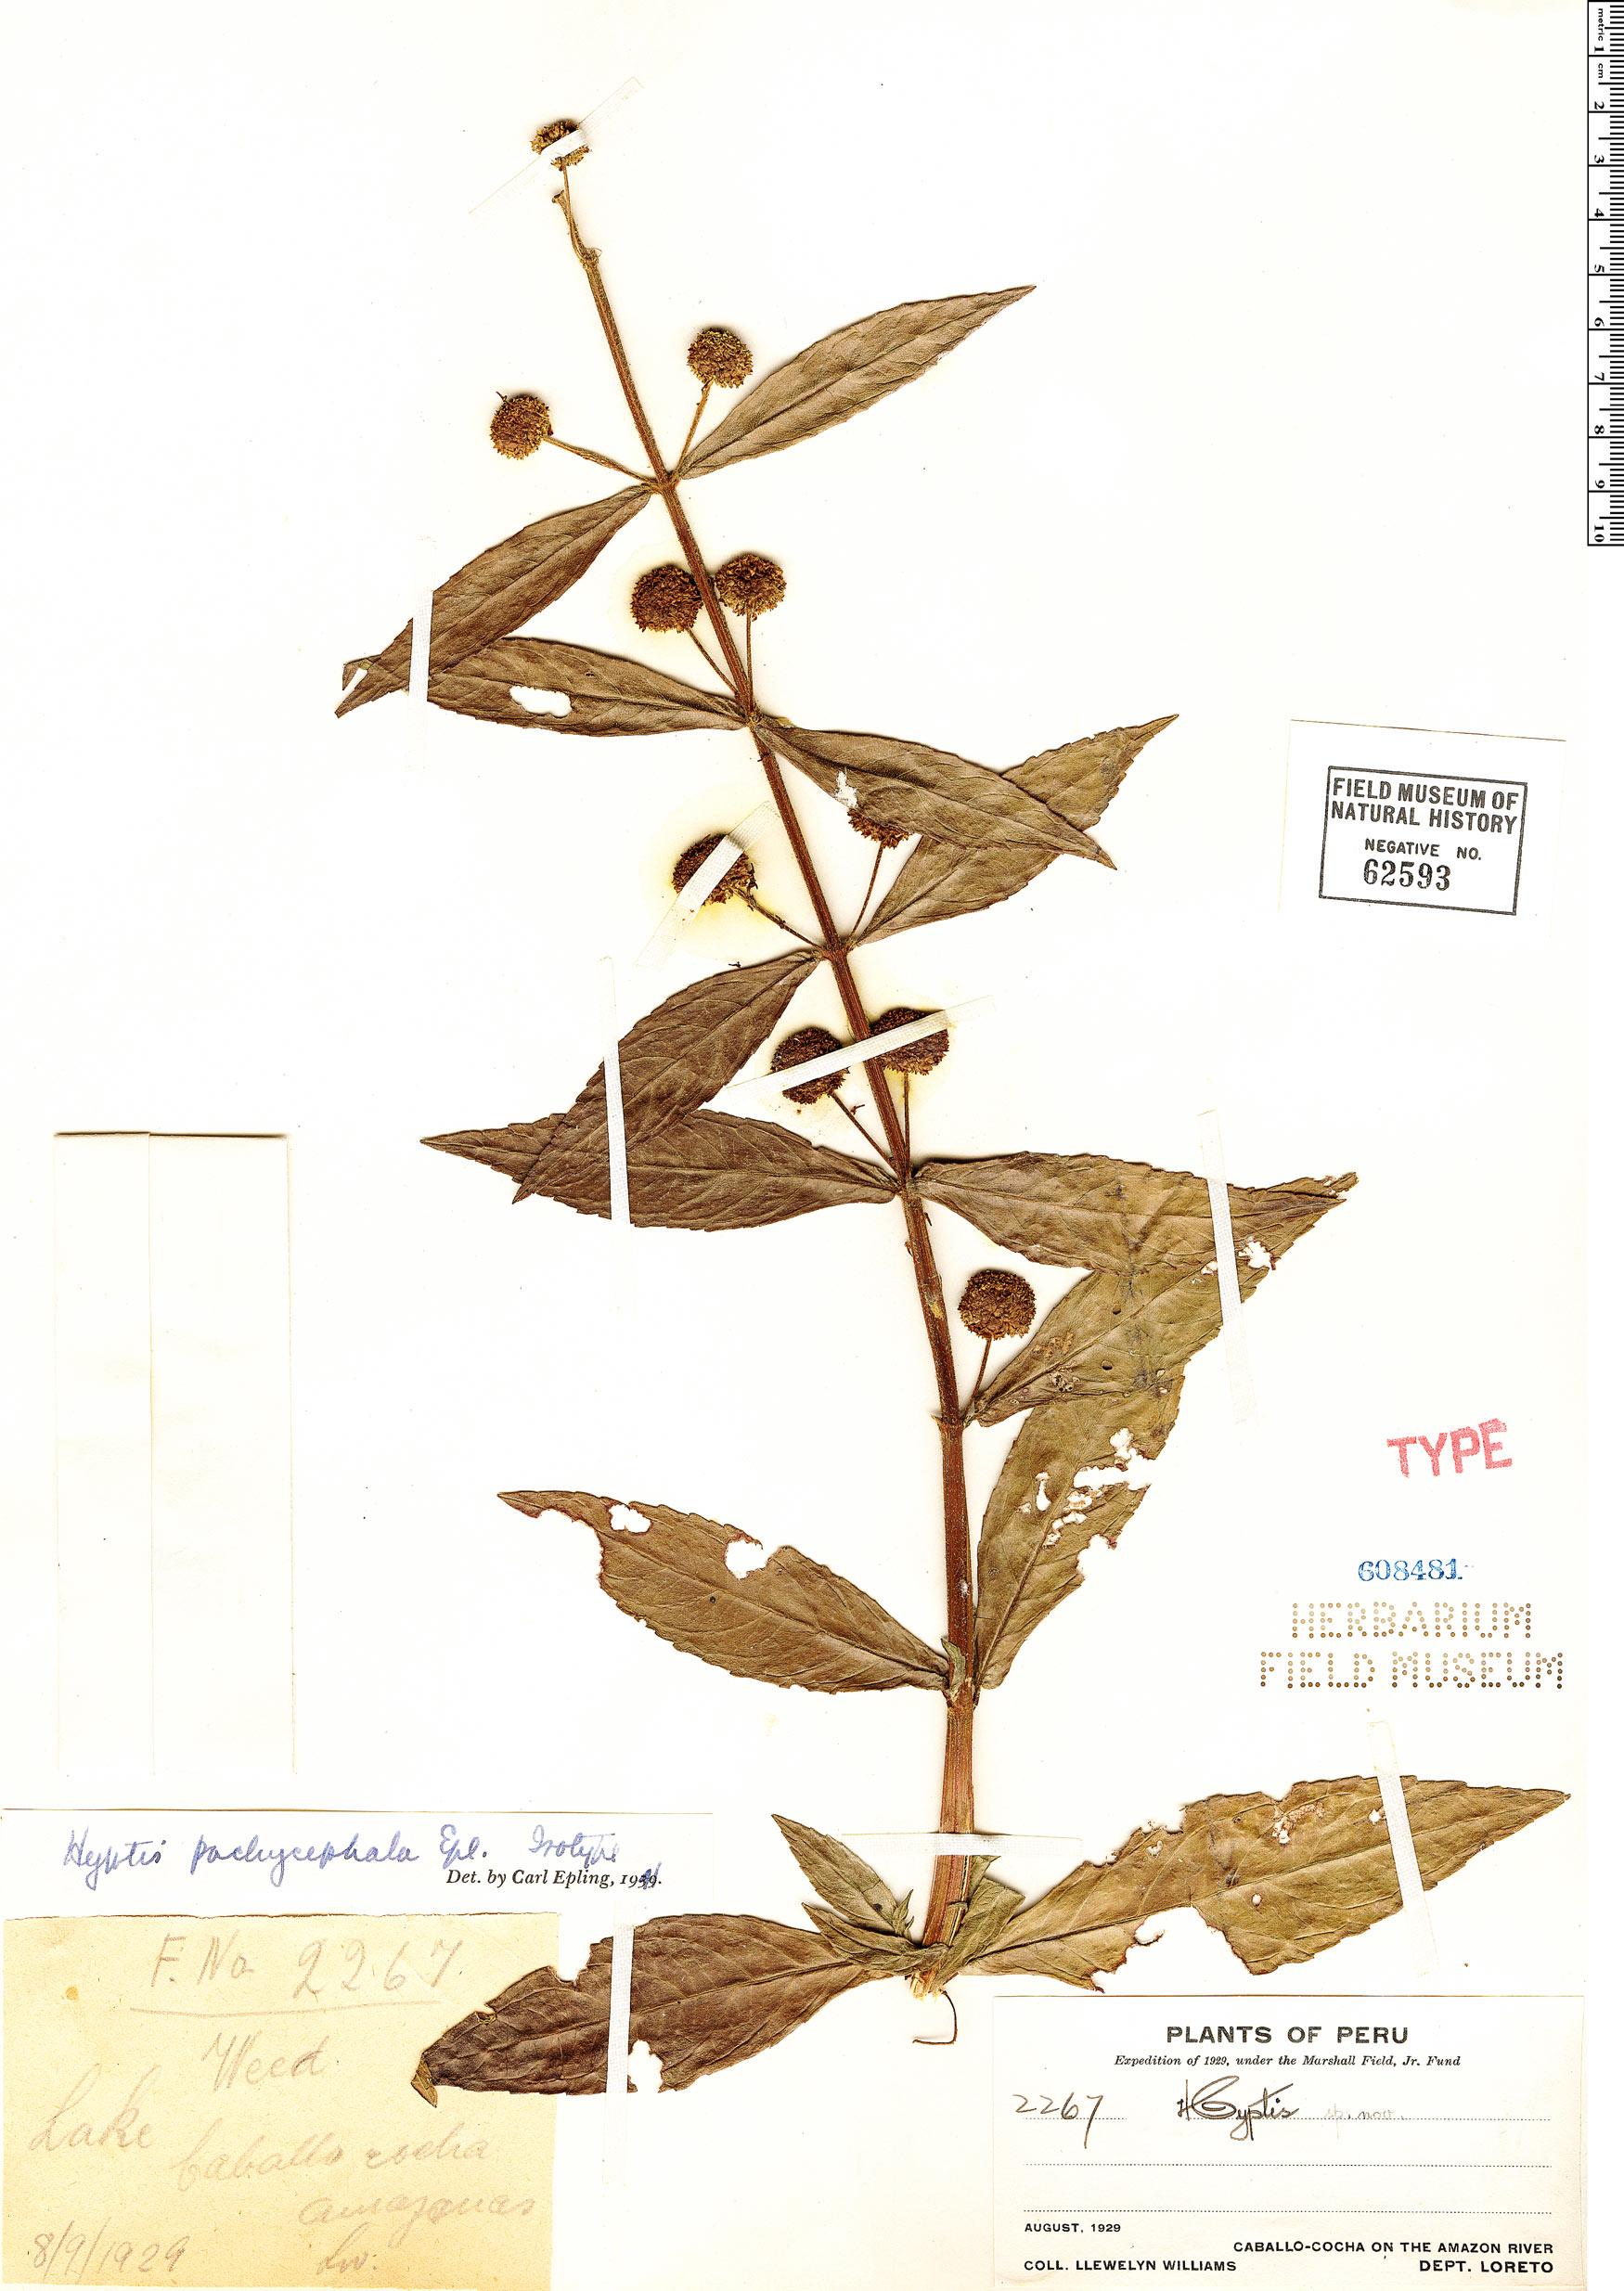 Specimen: Hyptis pachycephala